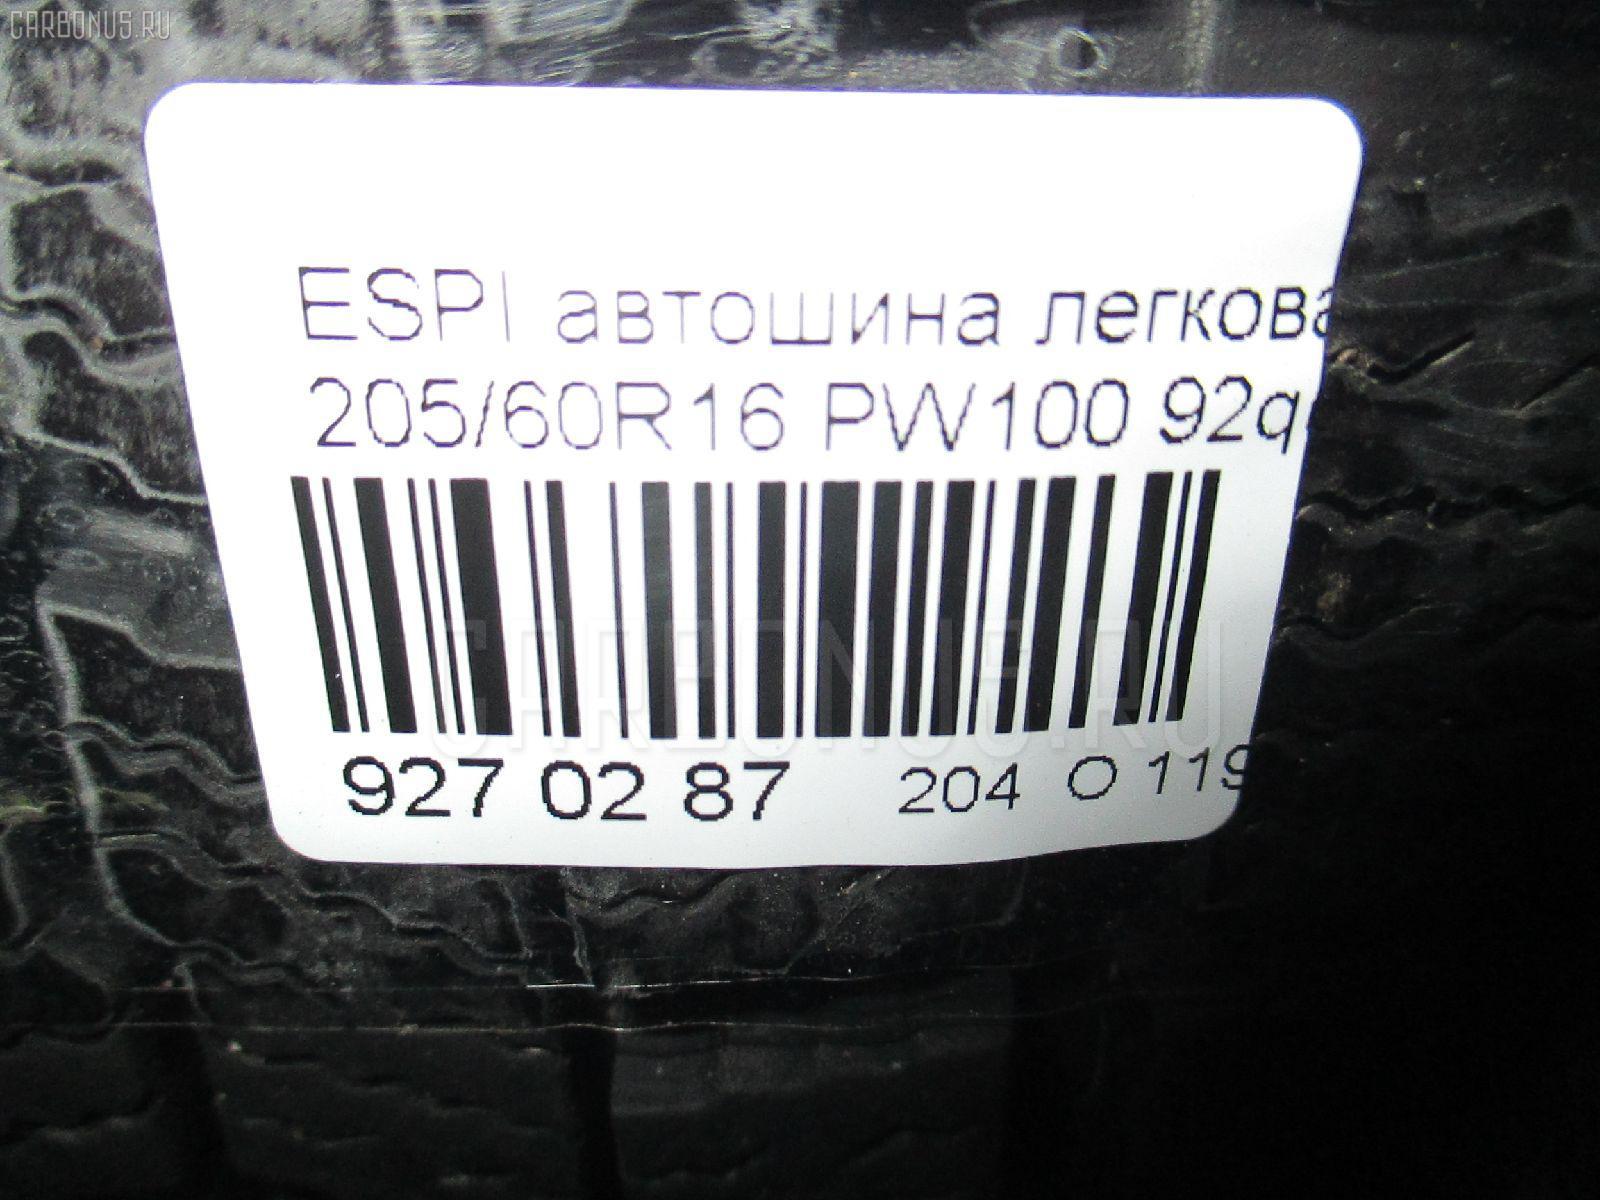 Автошина легковая зимняя ESPIA EPZ 205/60R16 FALKEN PW100 Фото 3